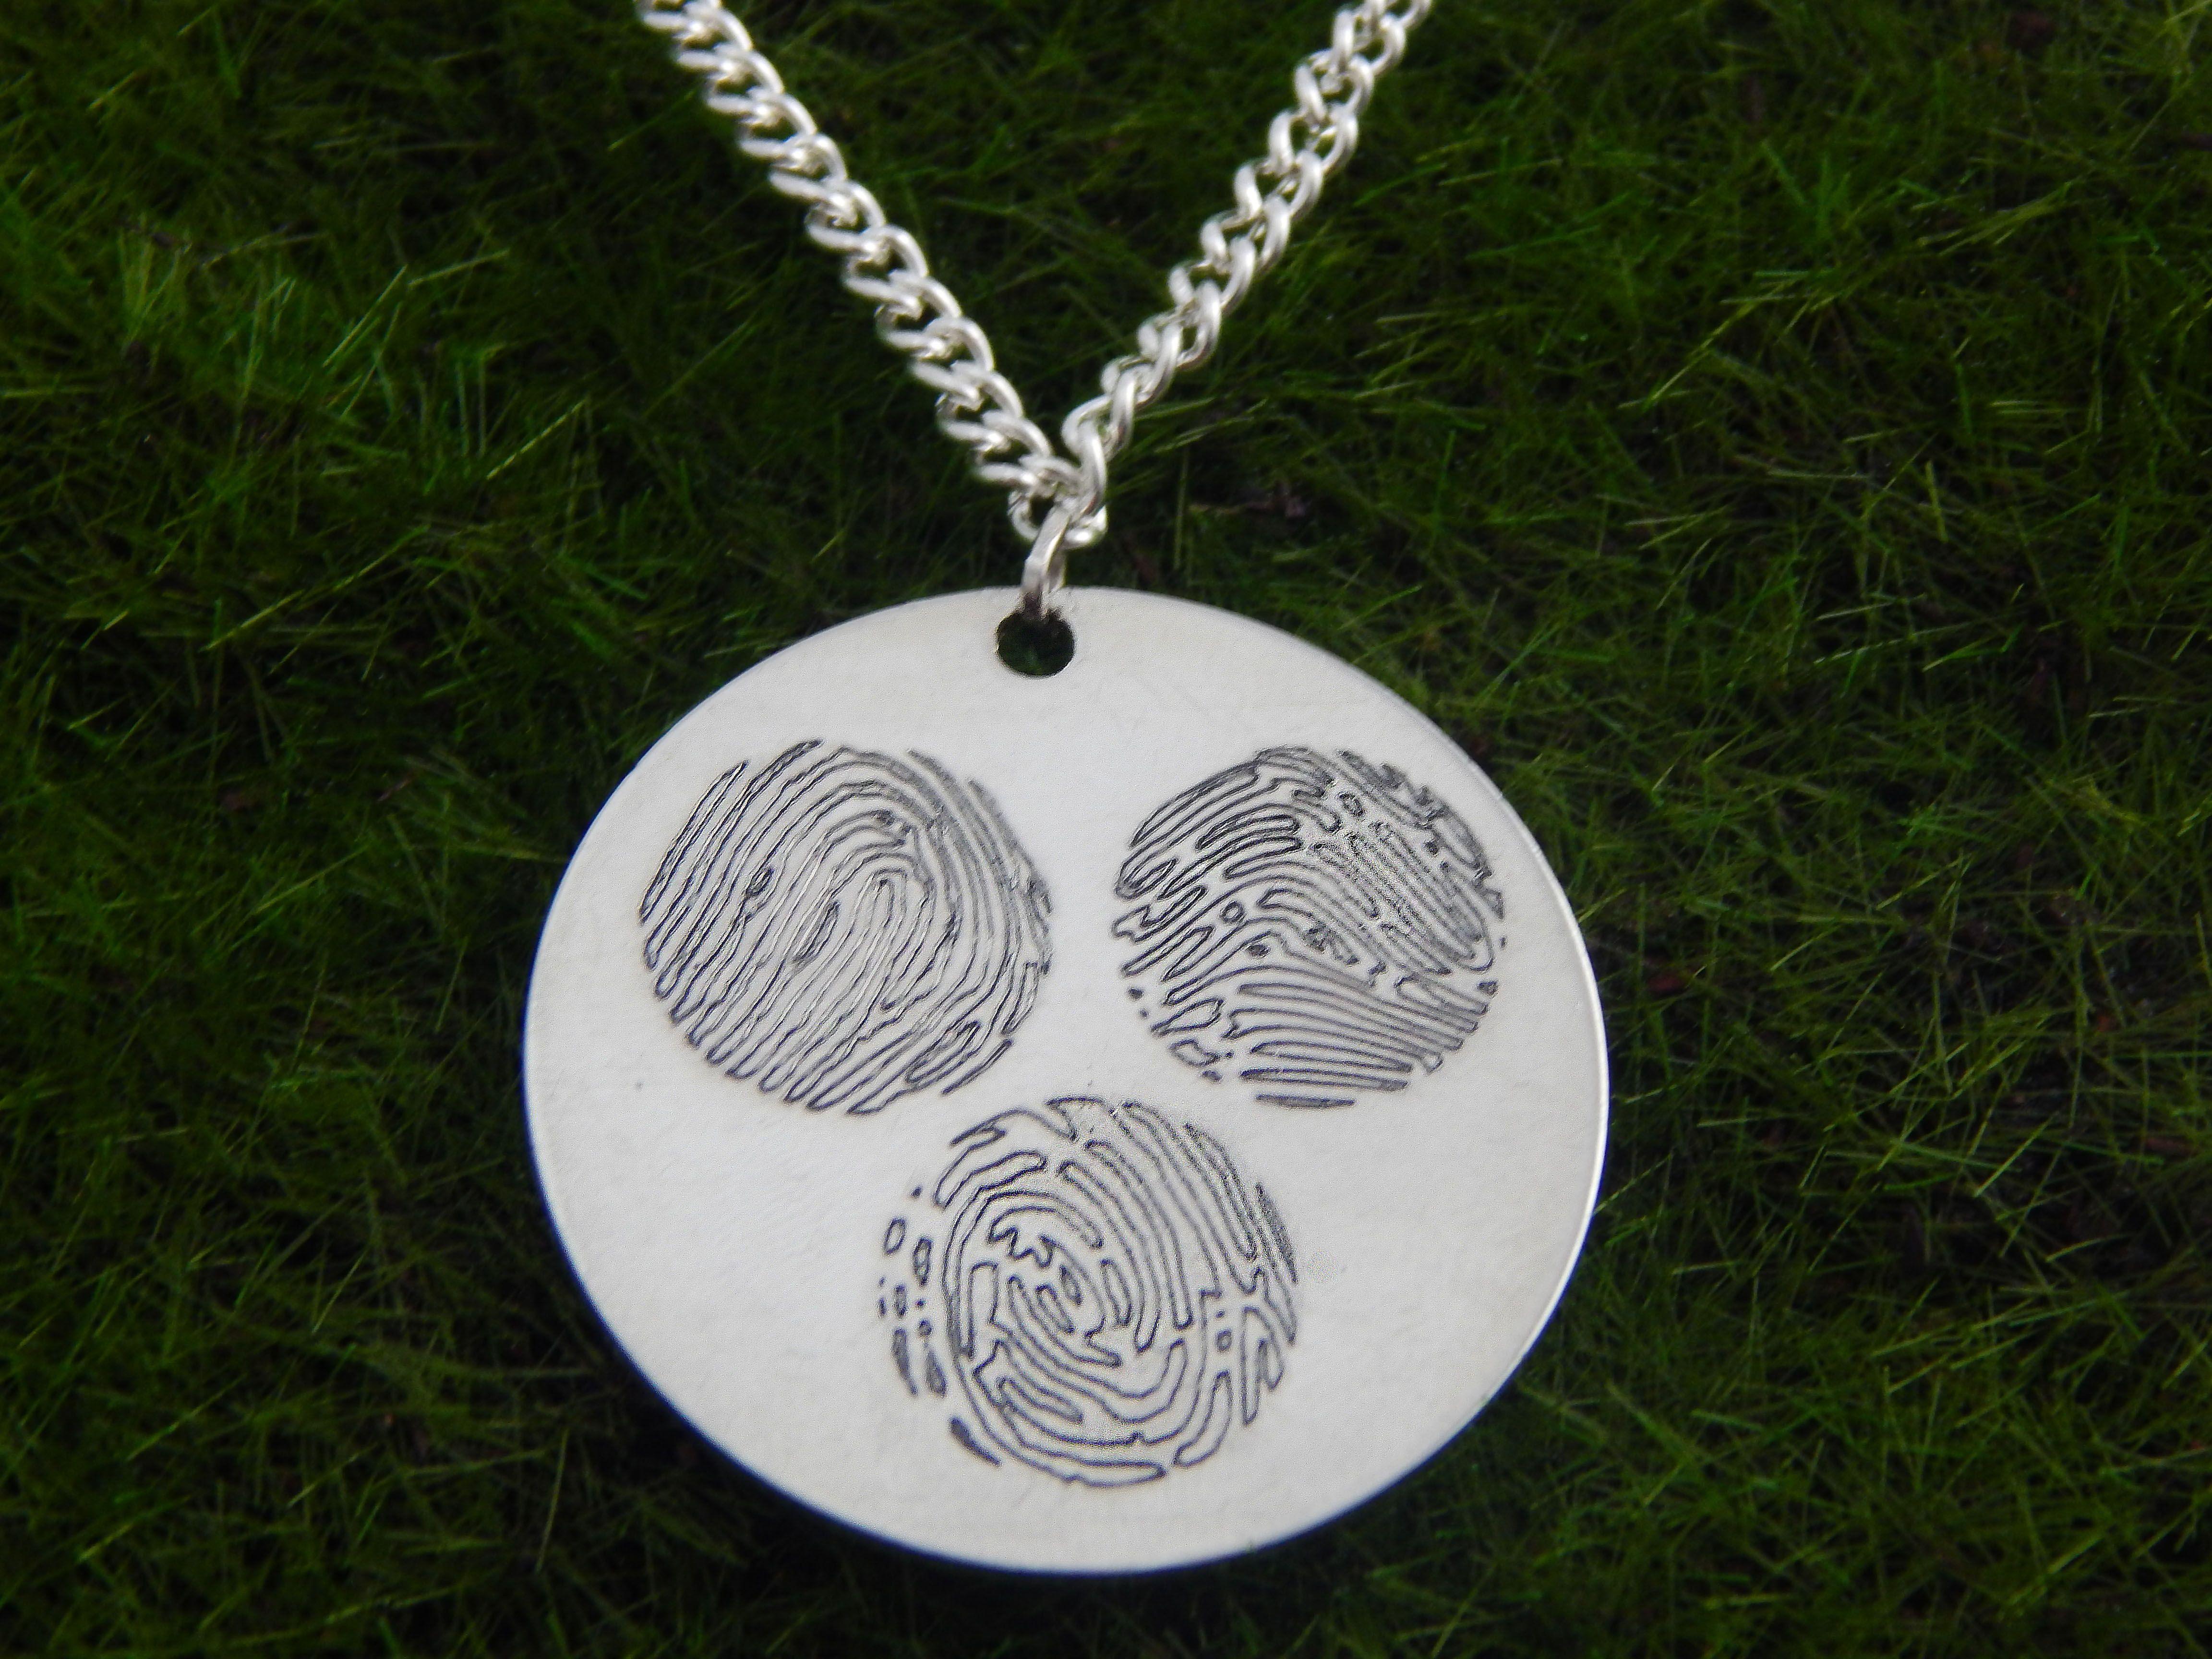 Playful Circles Dance Around this Custom Three Fingerprints Pendant Necklace